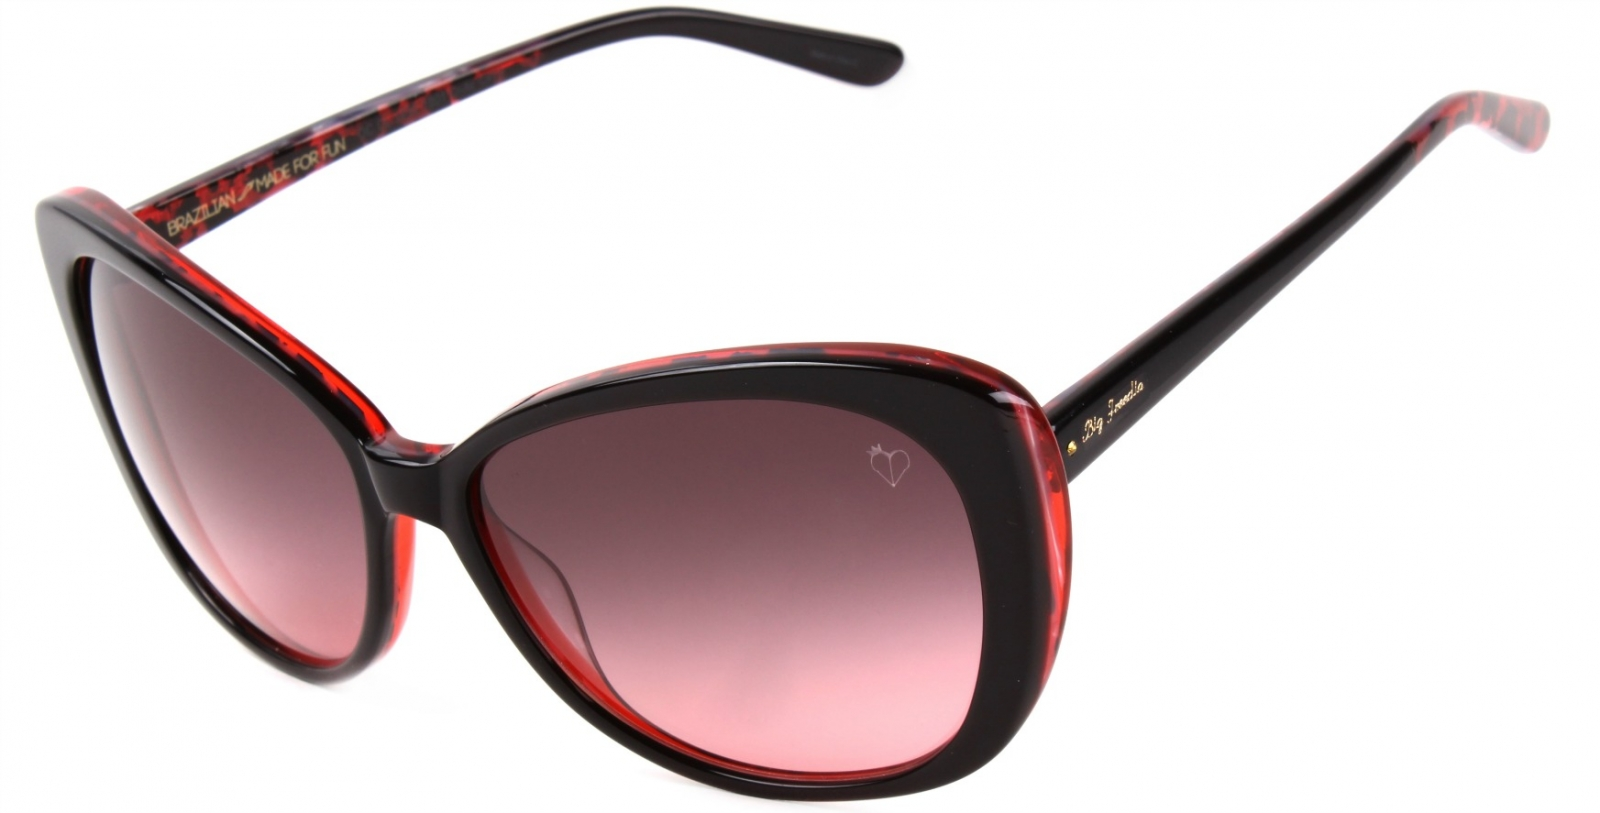 compras   moda   moda 2014   acessórios   óculos de Sol   modelos de óculos b02d2e1517